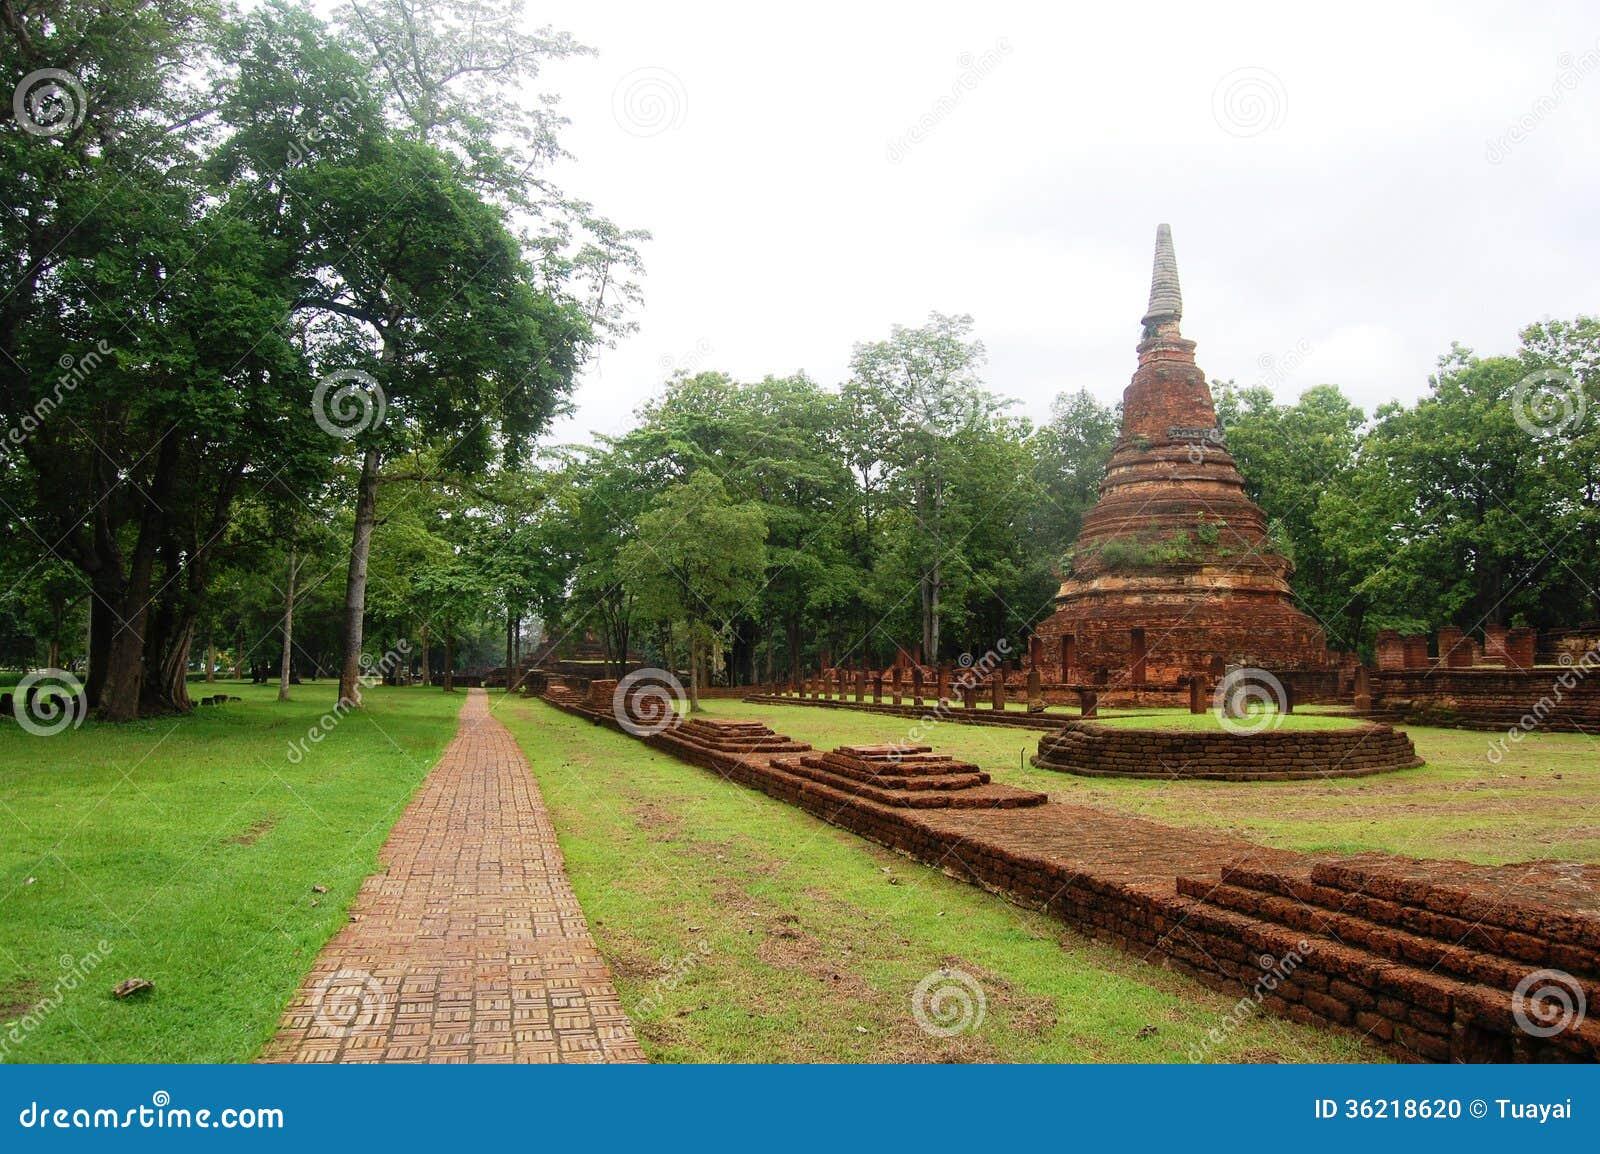 Kamphaeng Phet Historical Park Aranyik Area Buddha Of